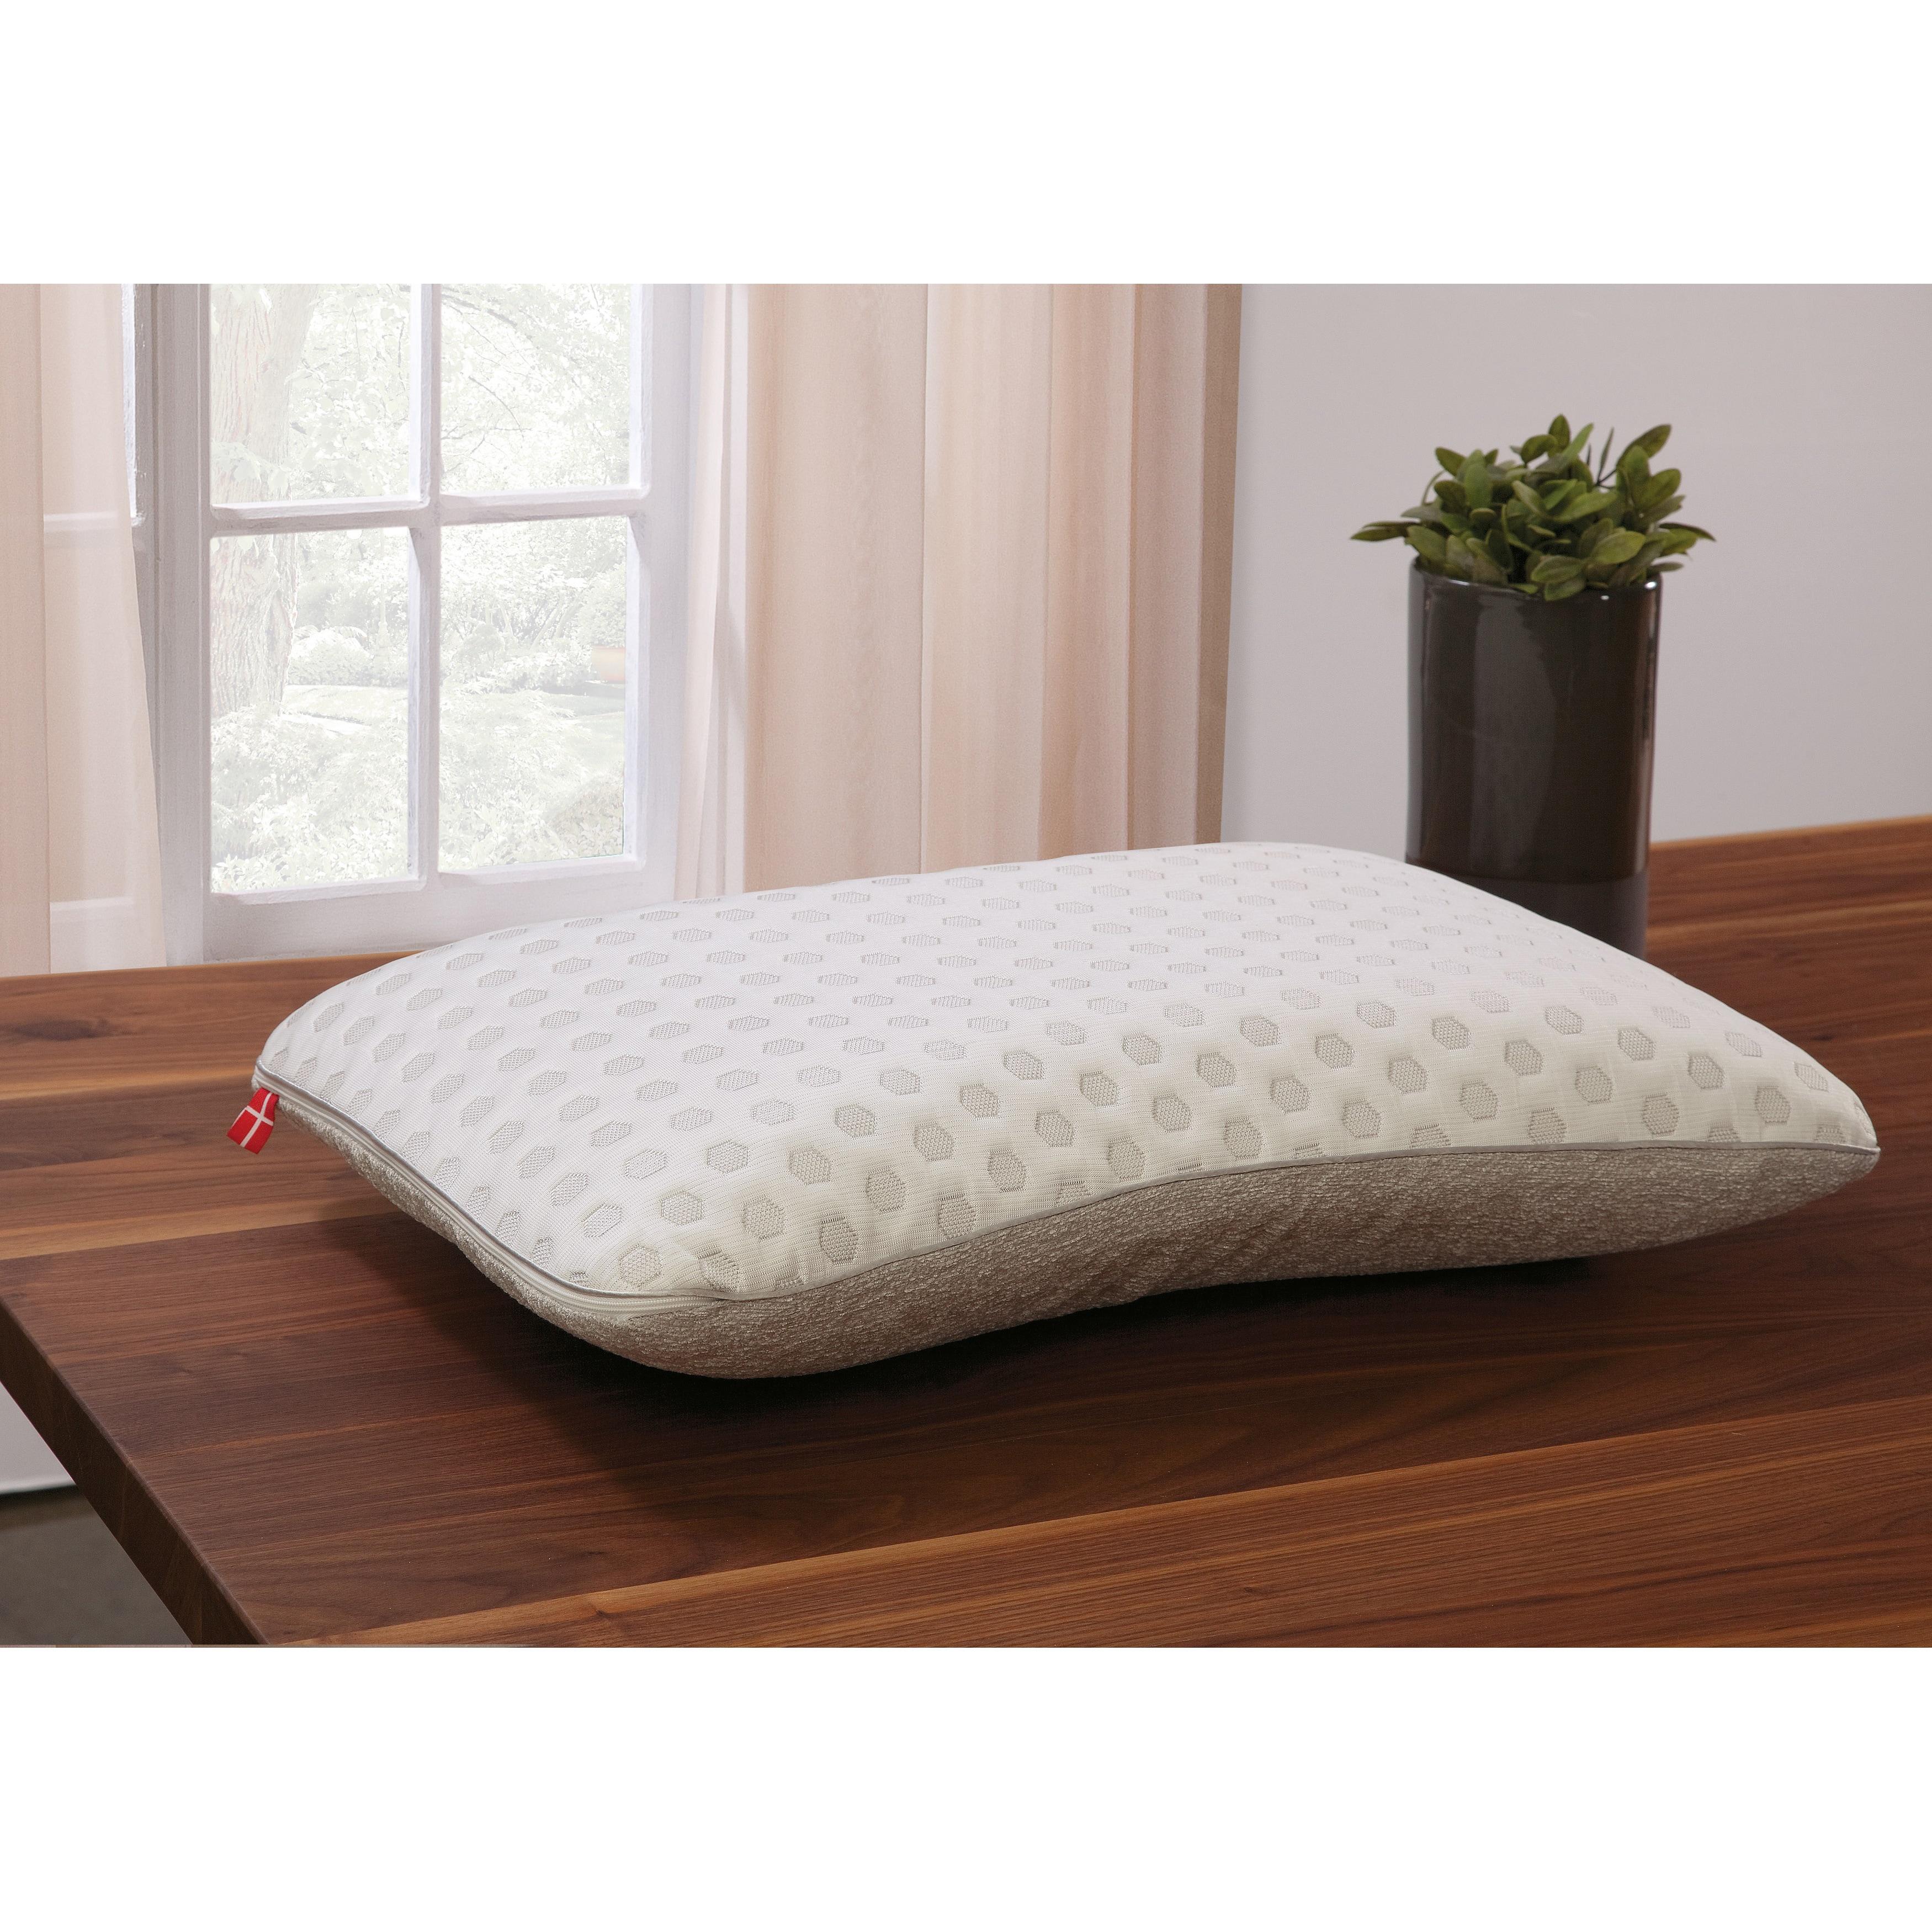 Danican Cool Pointe Memory Foam Forma Pillow (Cool Pointe...